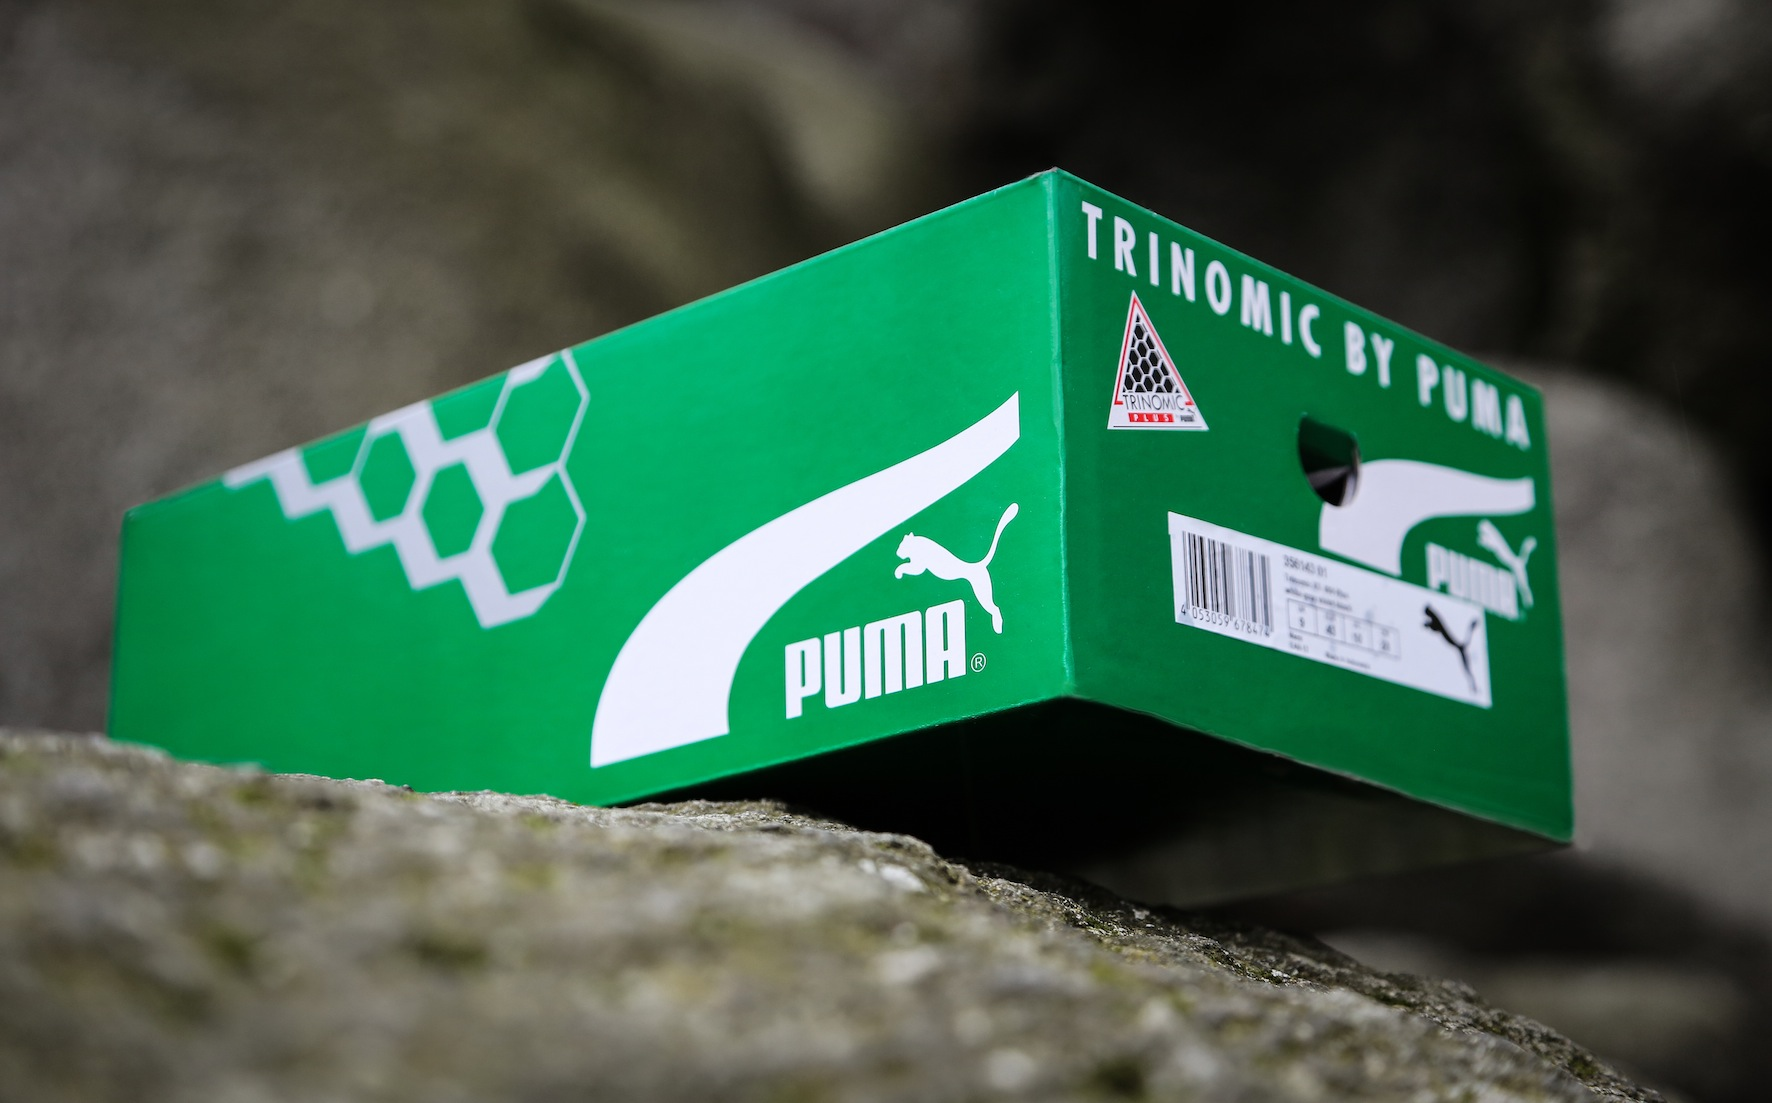 Puma Trinomic XS850 OG 10